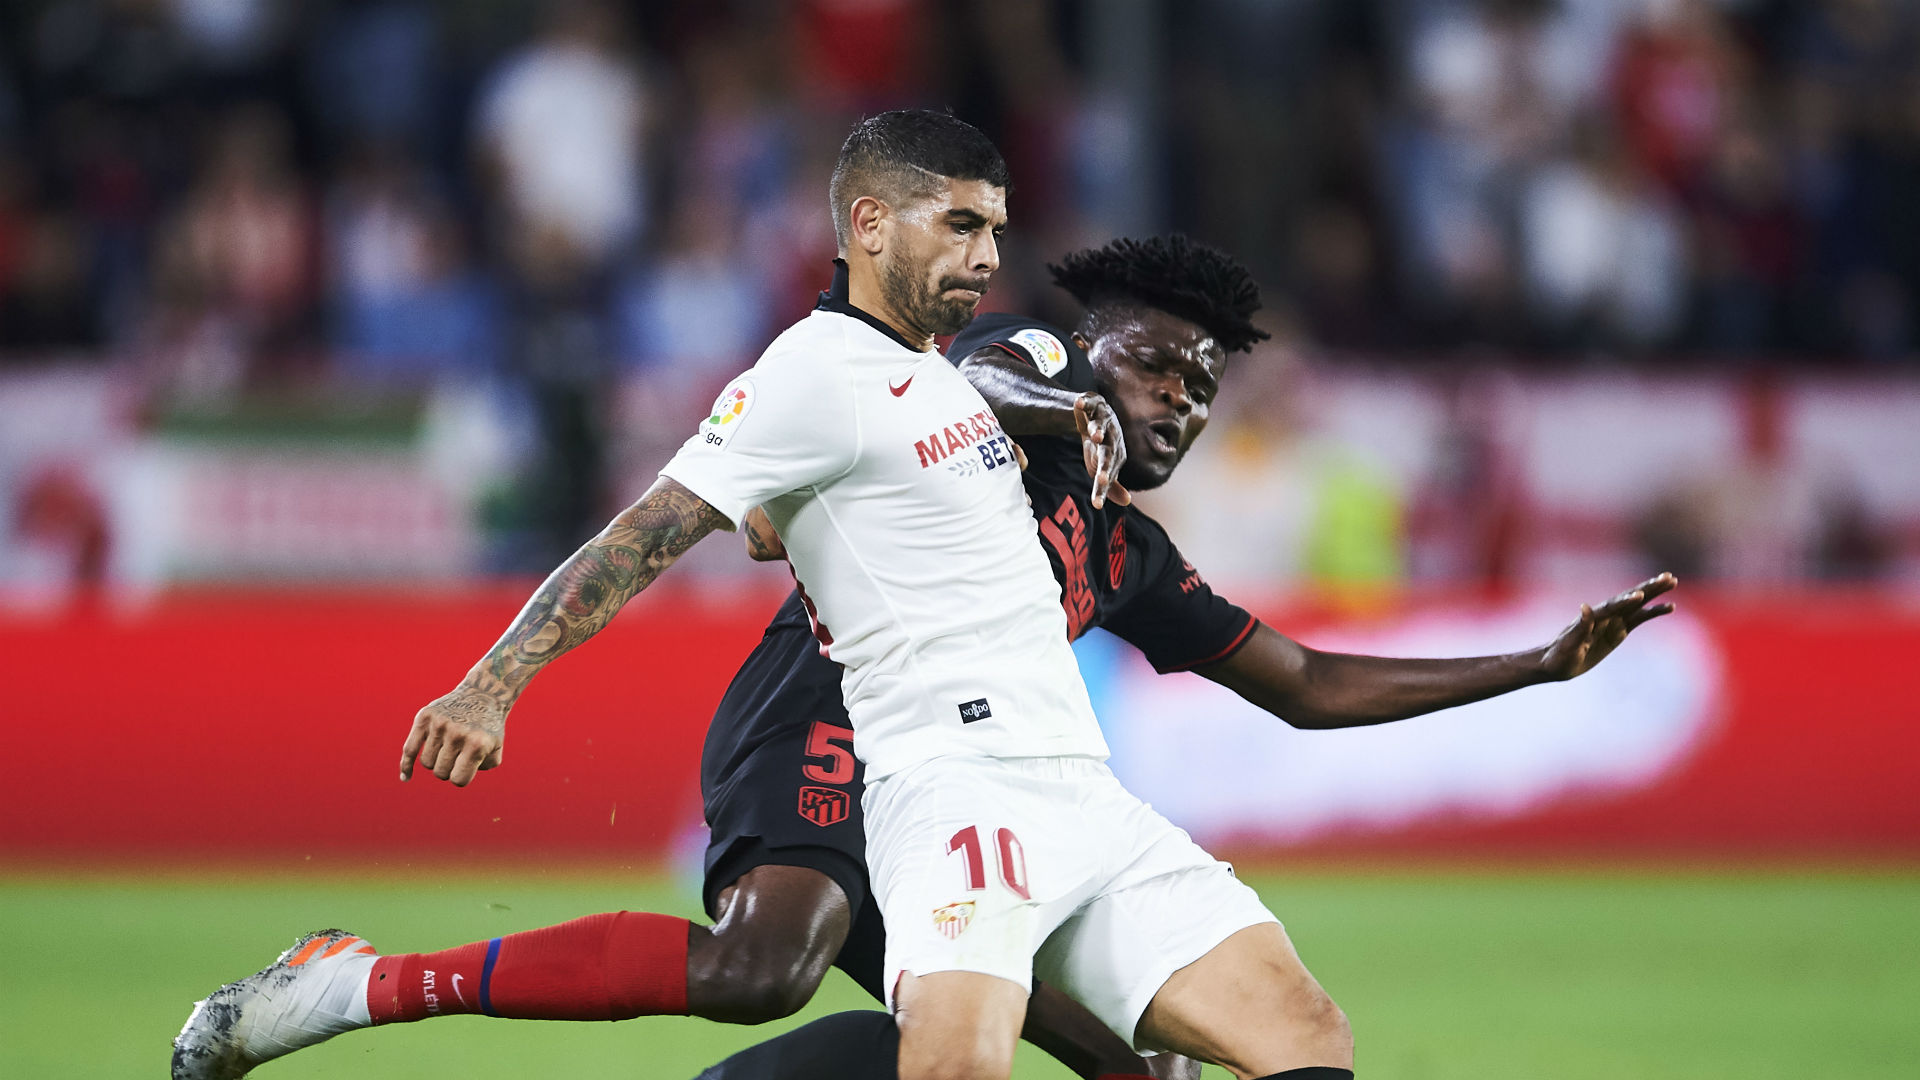 Al Shabab sign Sevilla playmaker Banega